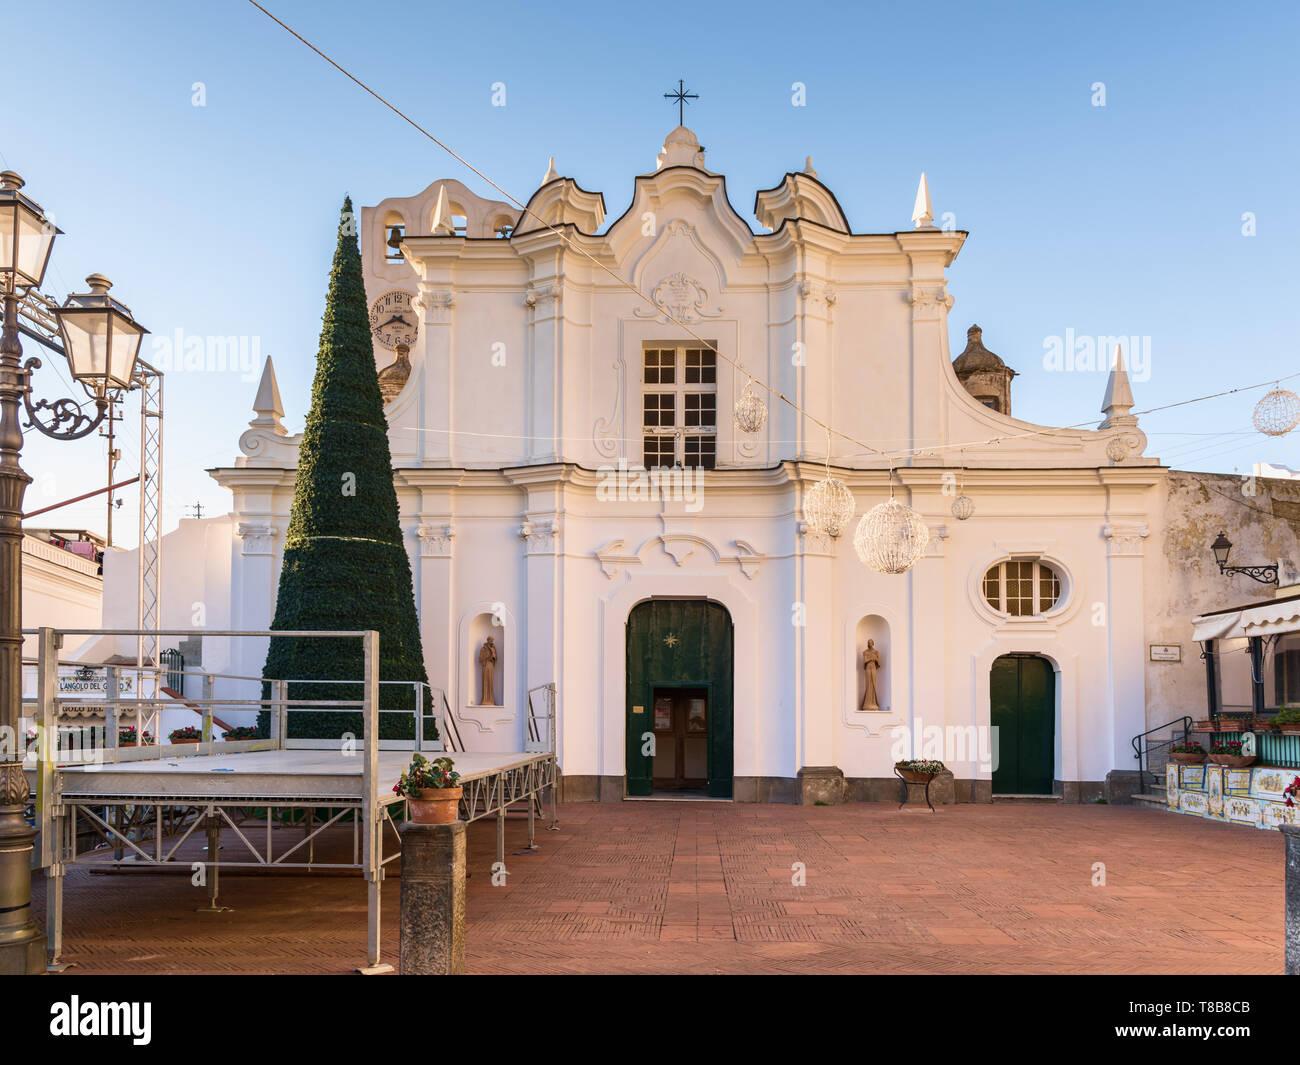 Chiesa di Santa Sofia, Anacapri, Italy Stock Photo